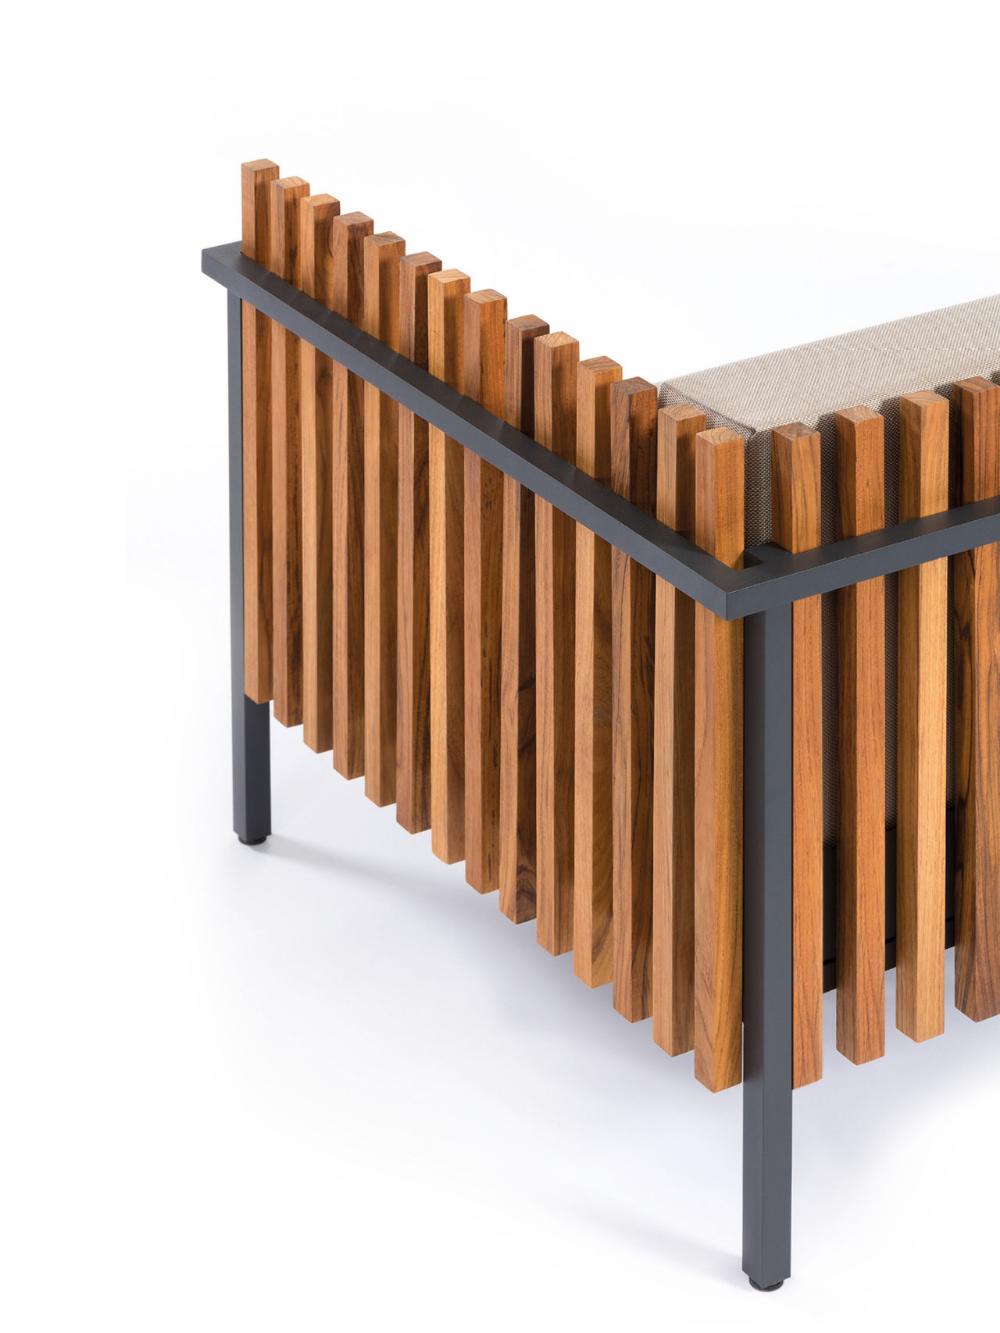 Product Design For Ego Paris Outdoor Furniture Sutra Outdoor Furniture Design Sutra